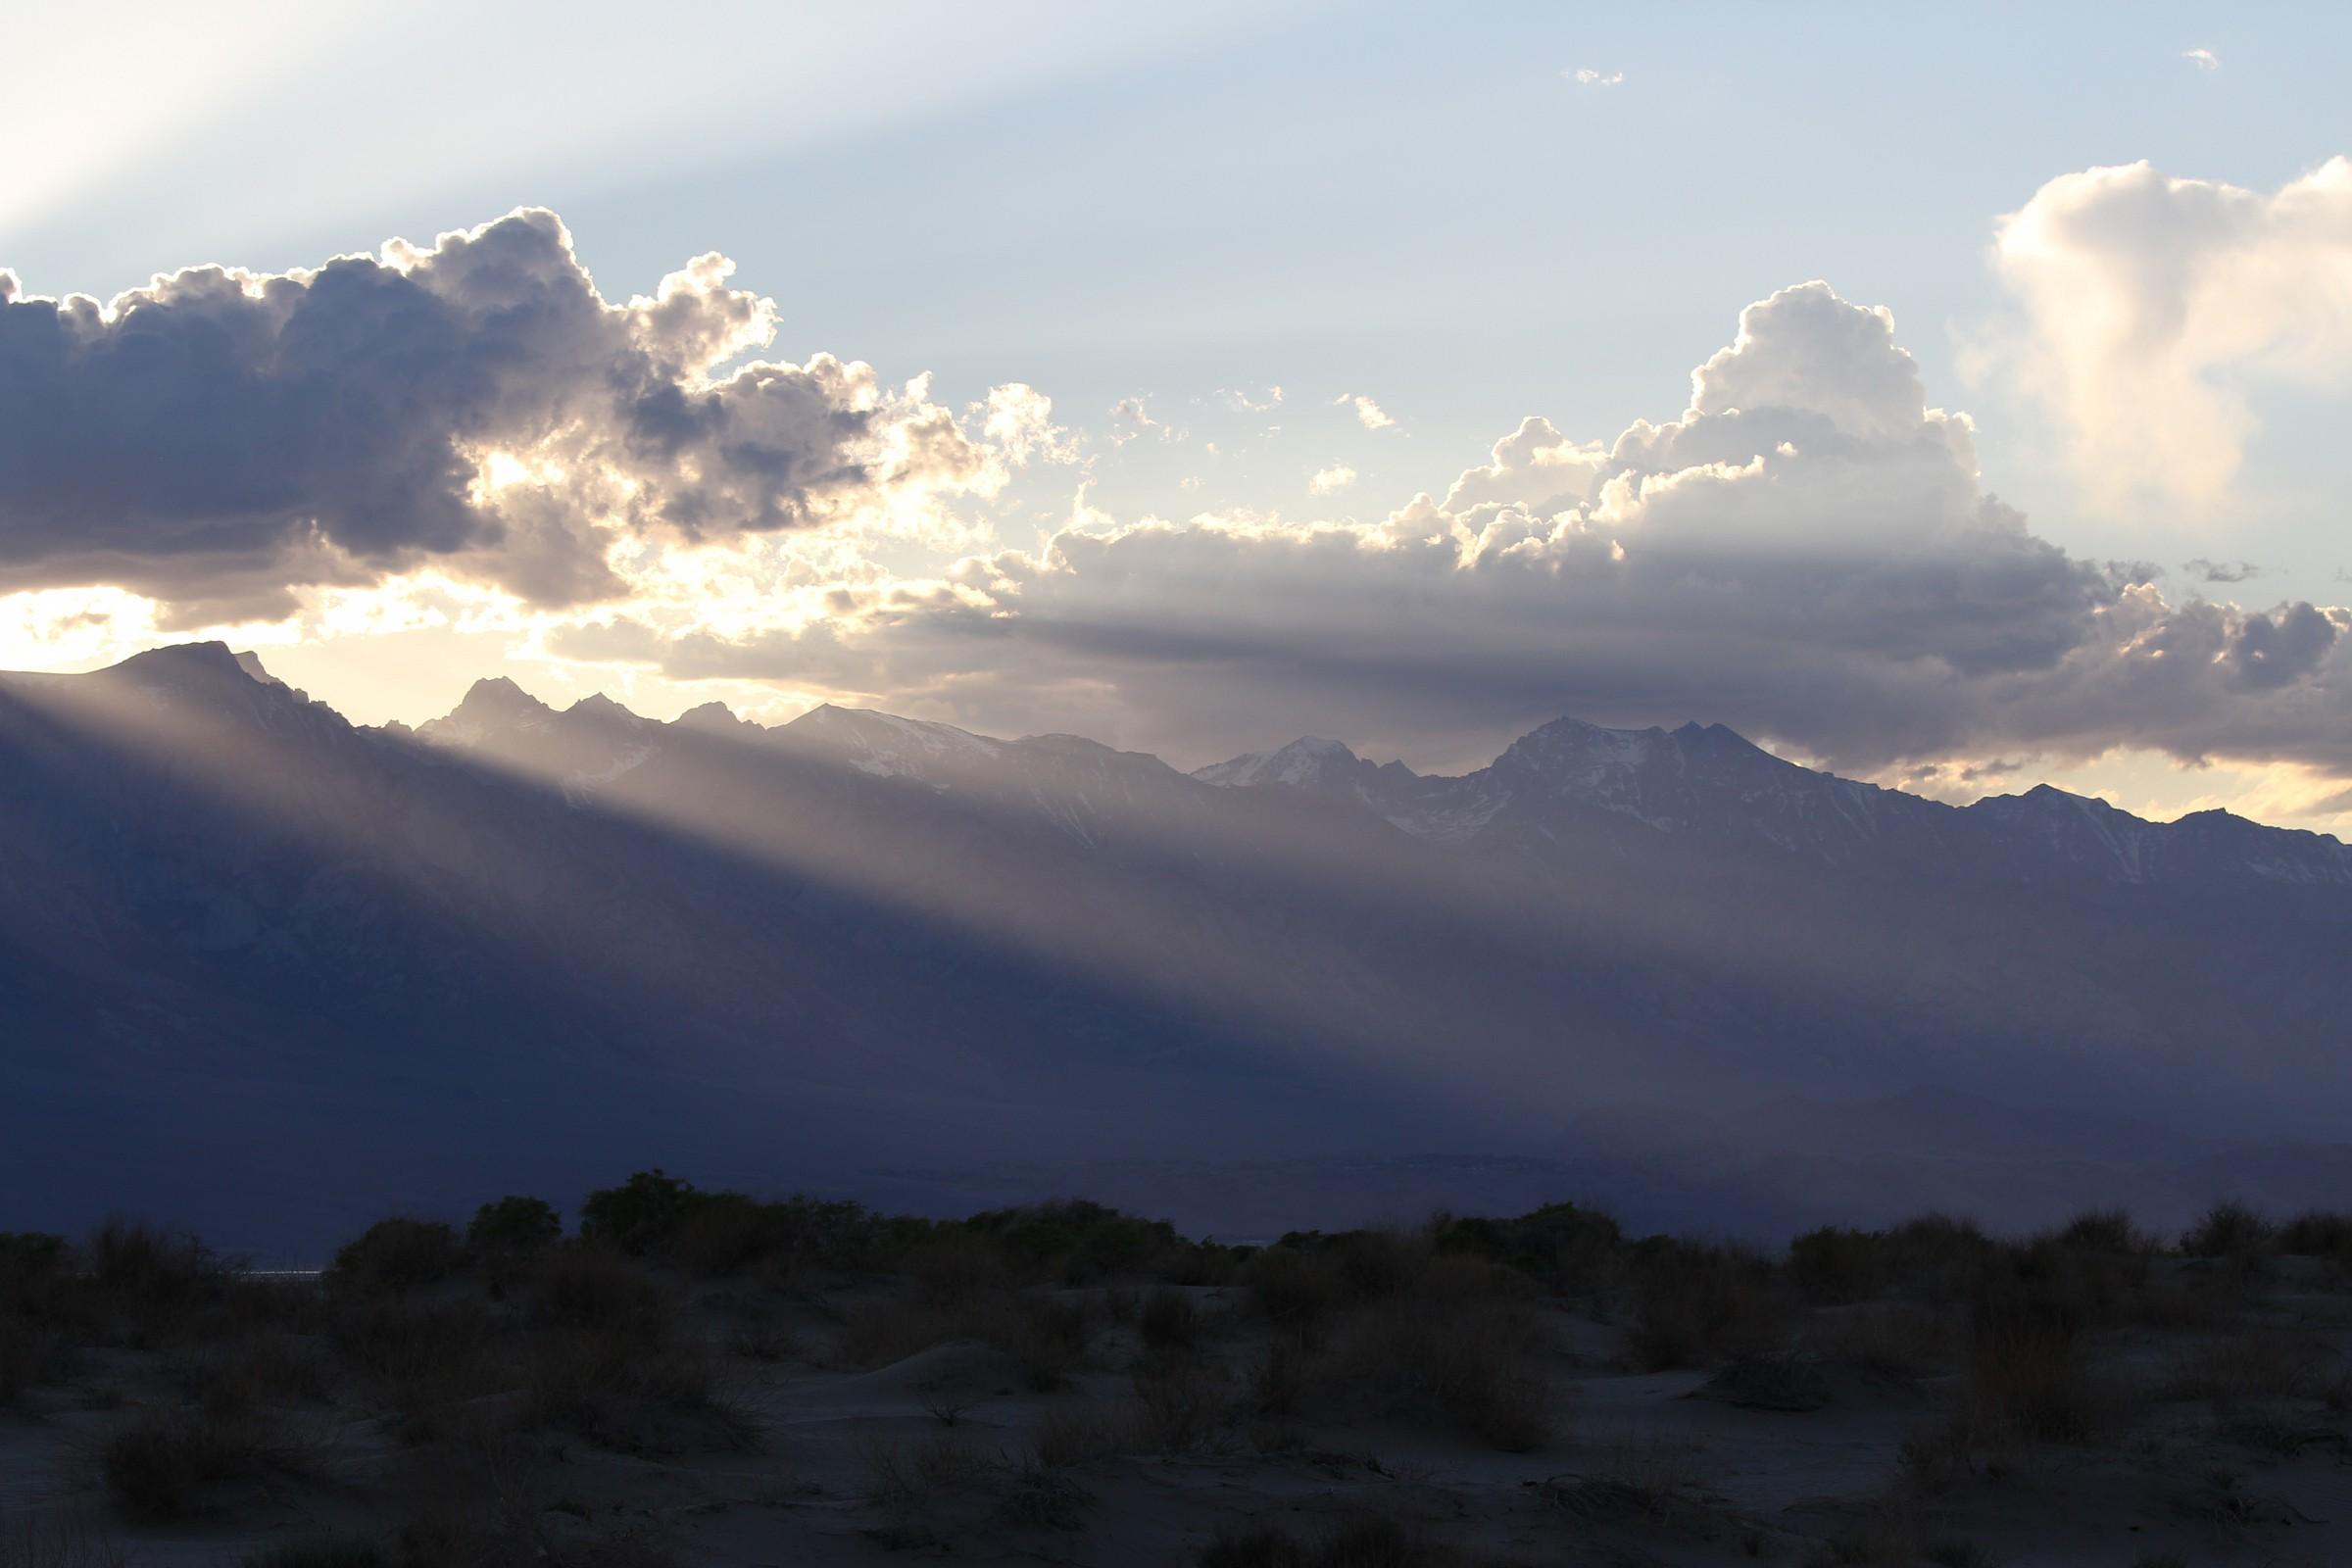 Sierra Nevada montagne al tramonto...